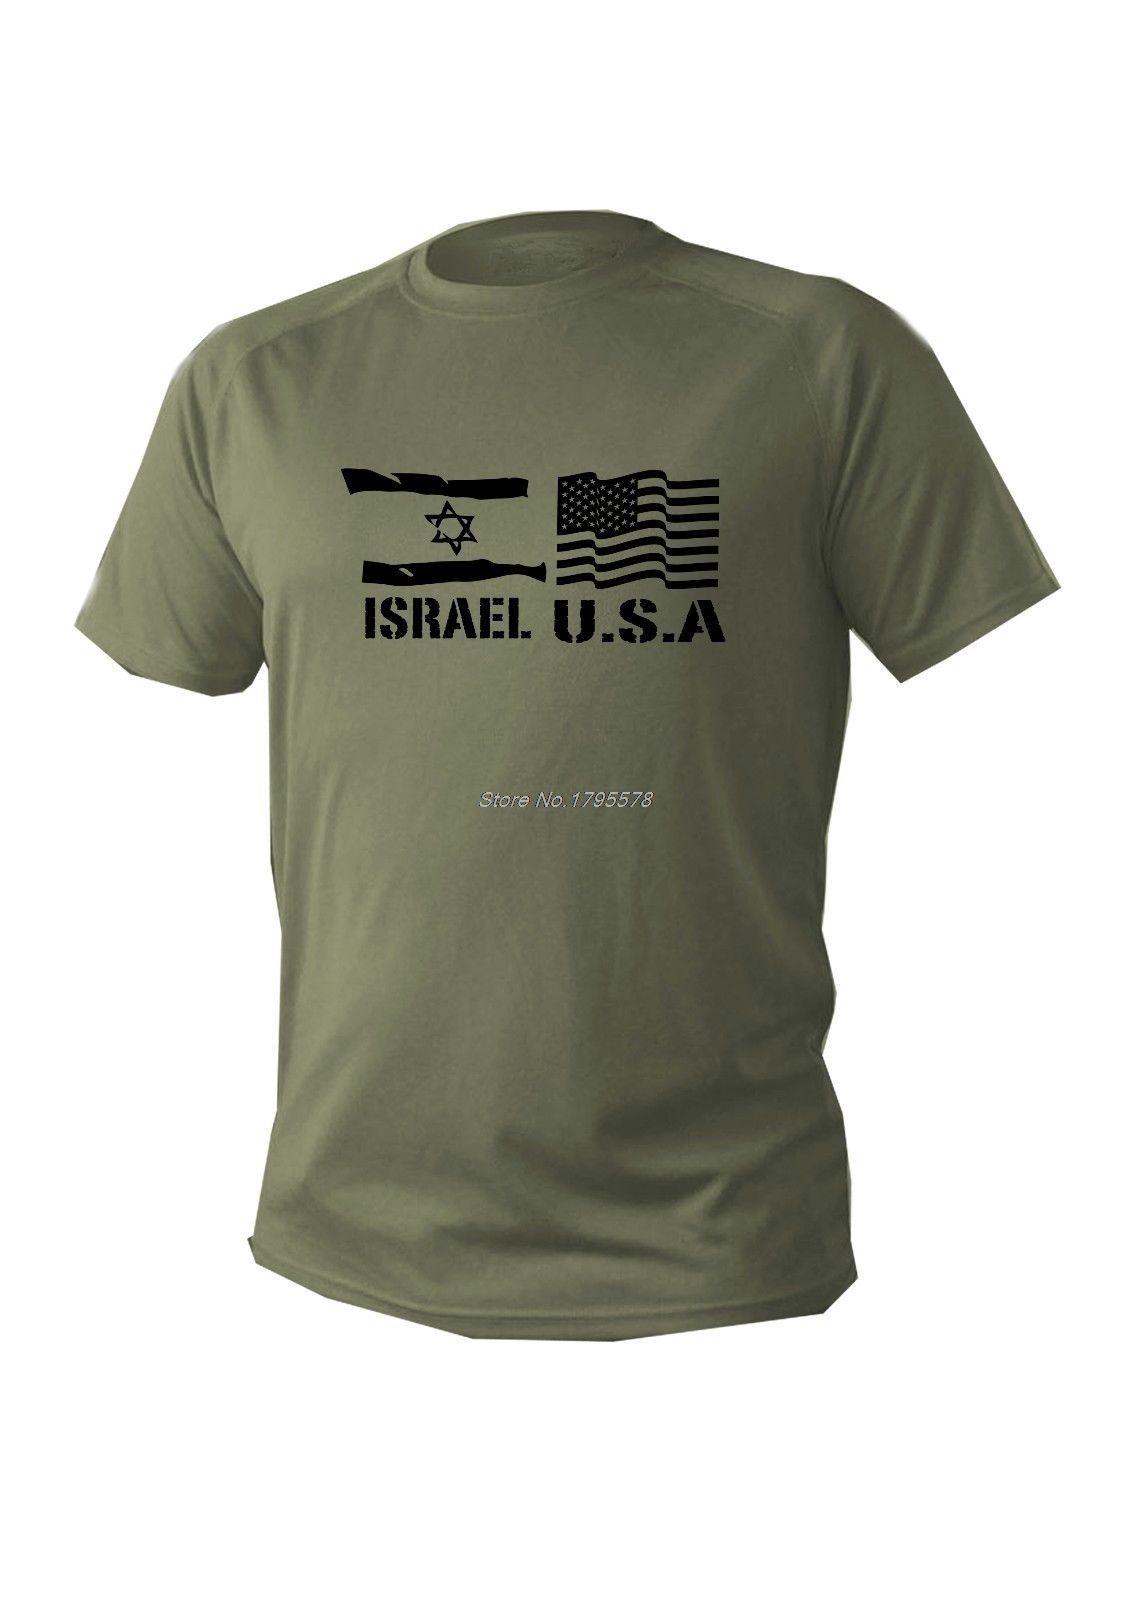 New Verão Men Cotton T-shirt Casual Green Olive Israel Bandeiras dos EUA Militar T do exército camiseta Cool Tees Tops Harajuku Streetwear